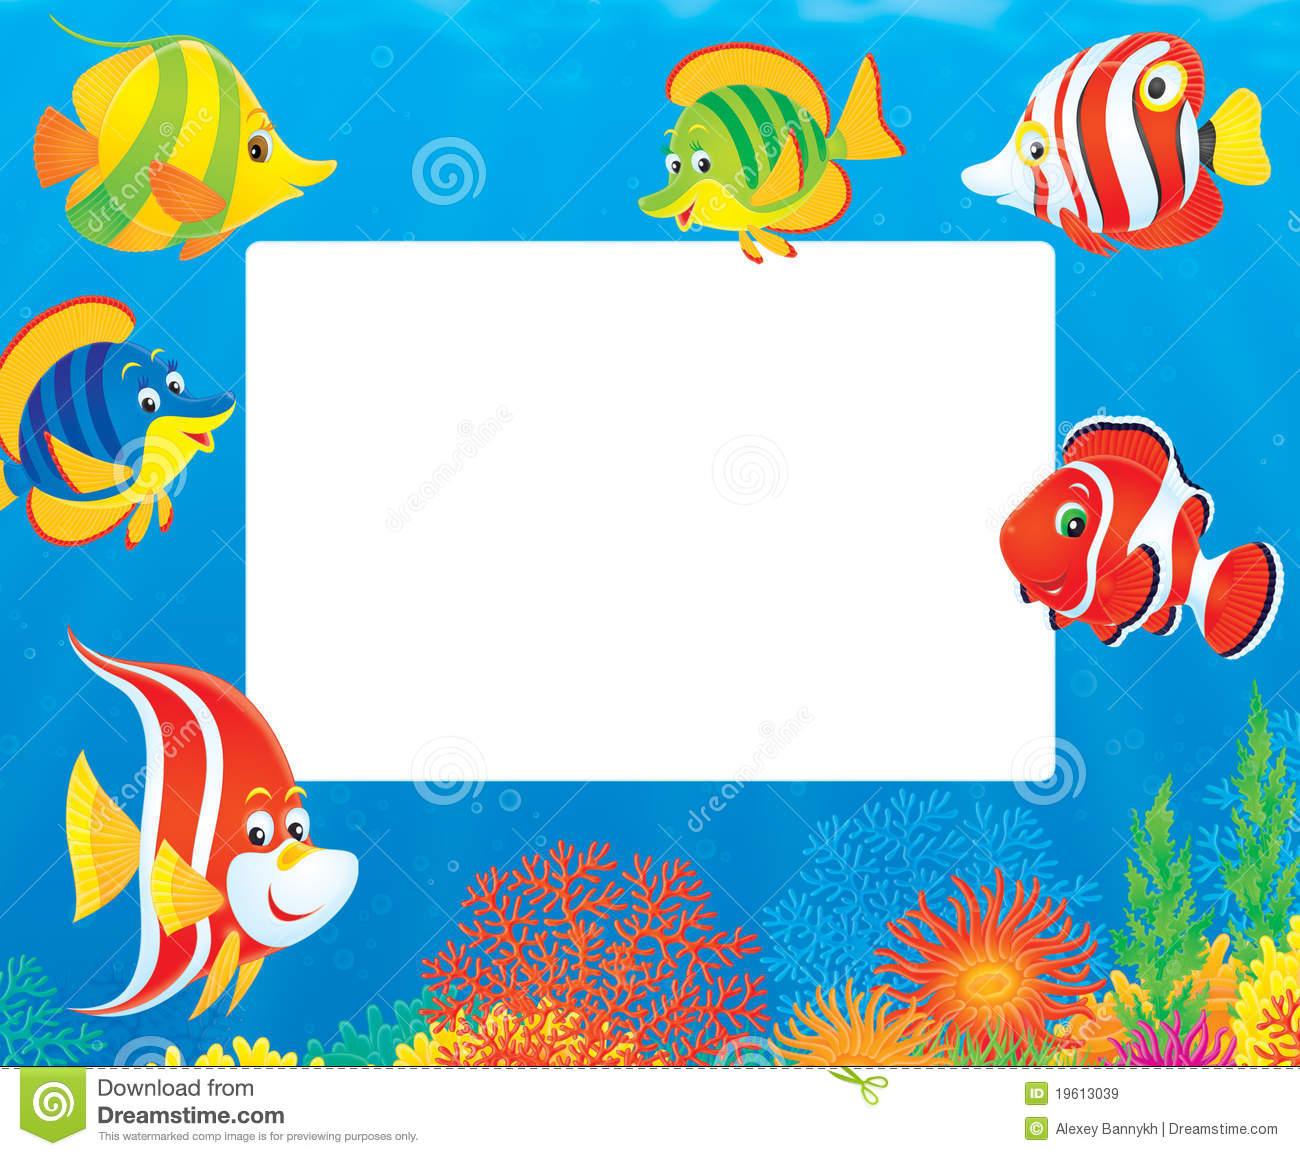 Tropical Fish Border Clipart - Clipart Kid